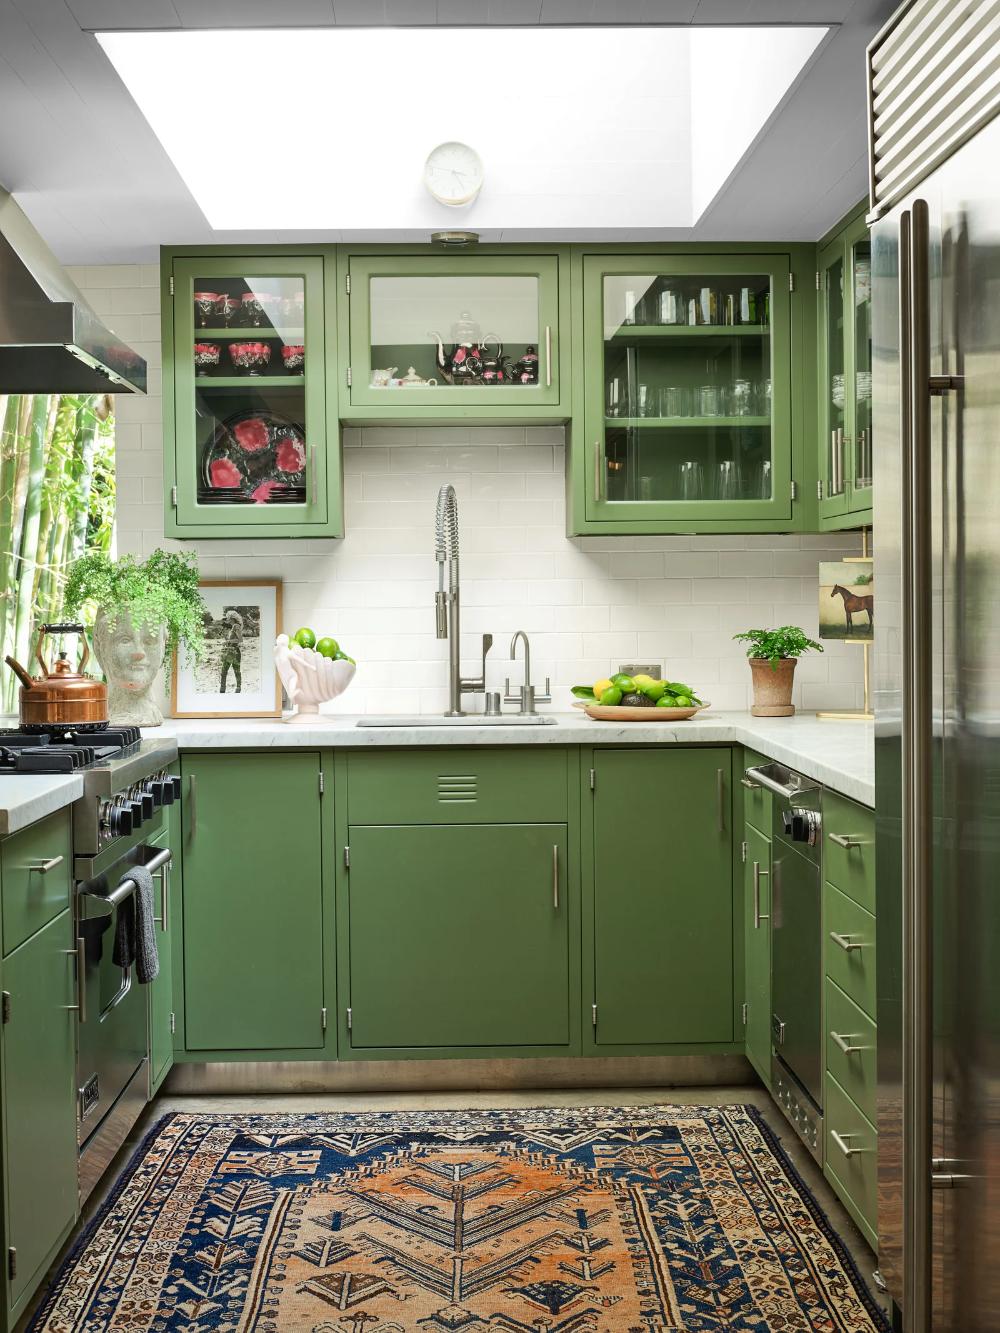 Step Inside Dakota Johnson's MidcenturyModern Home